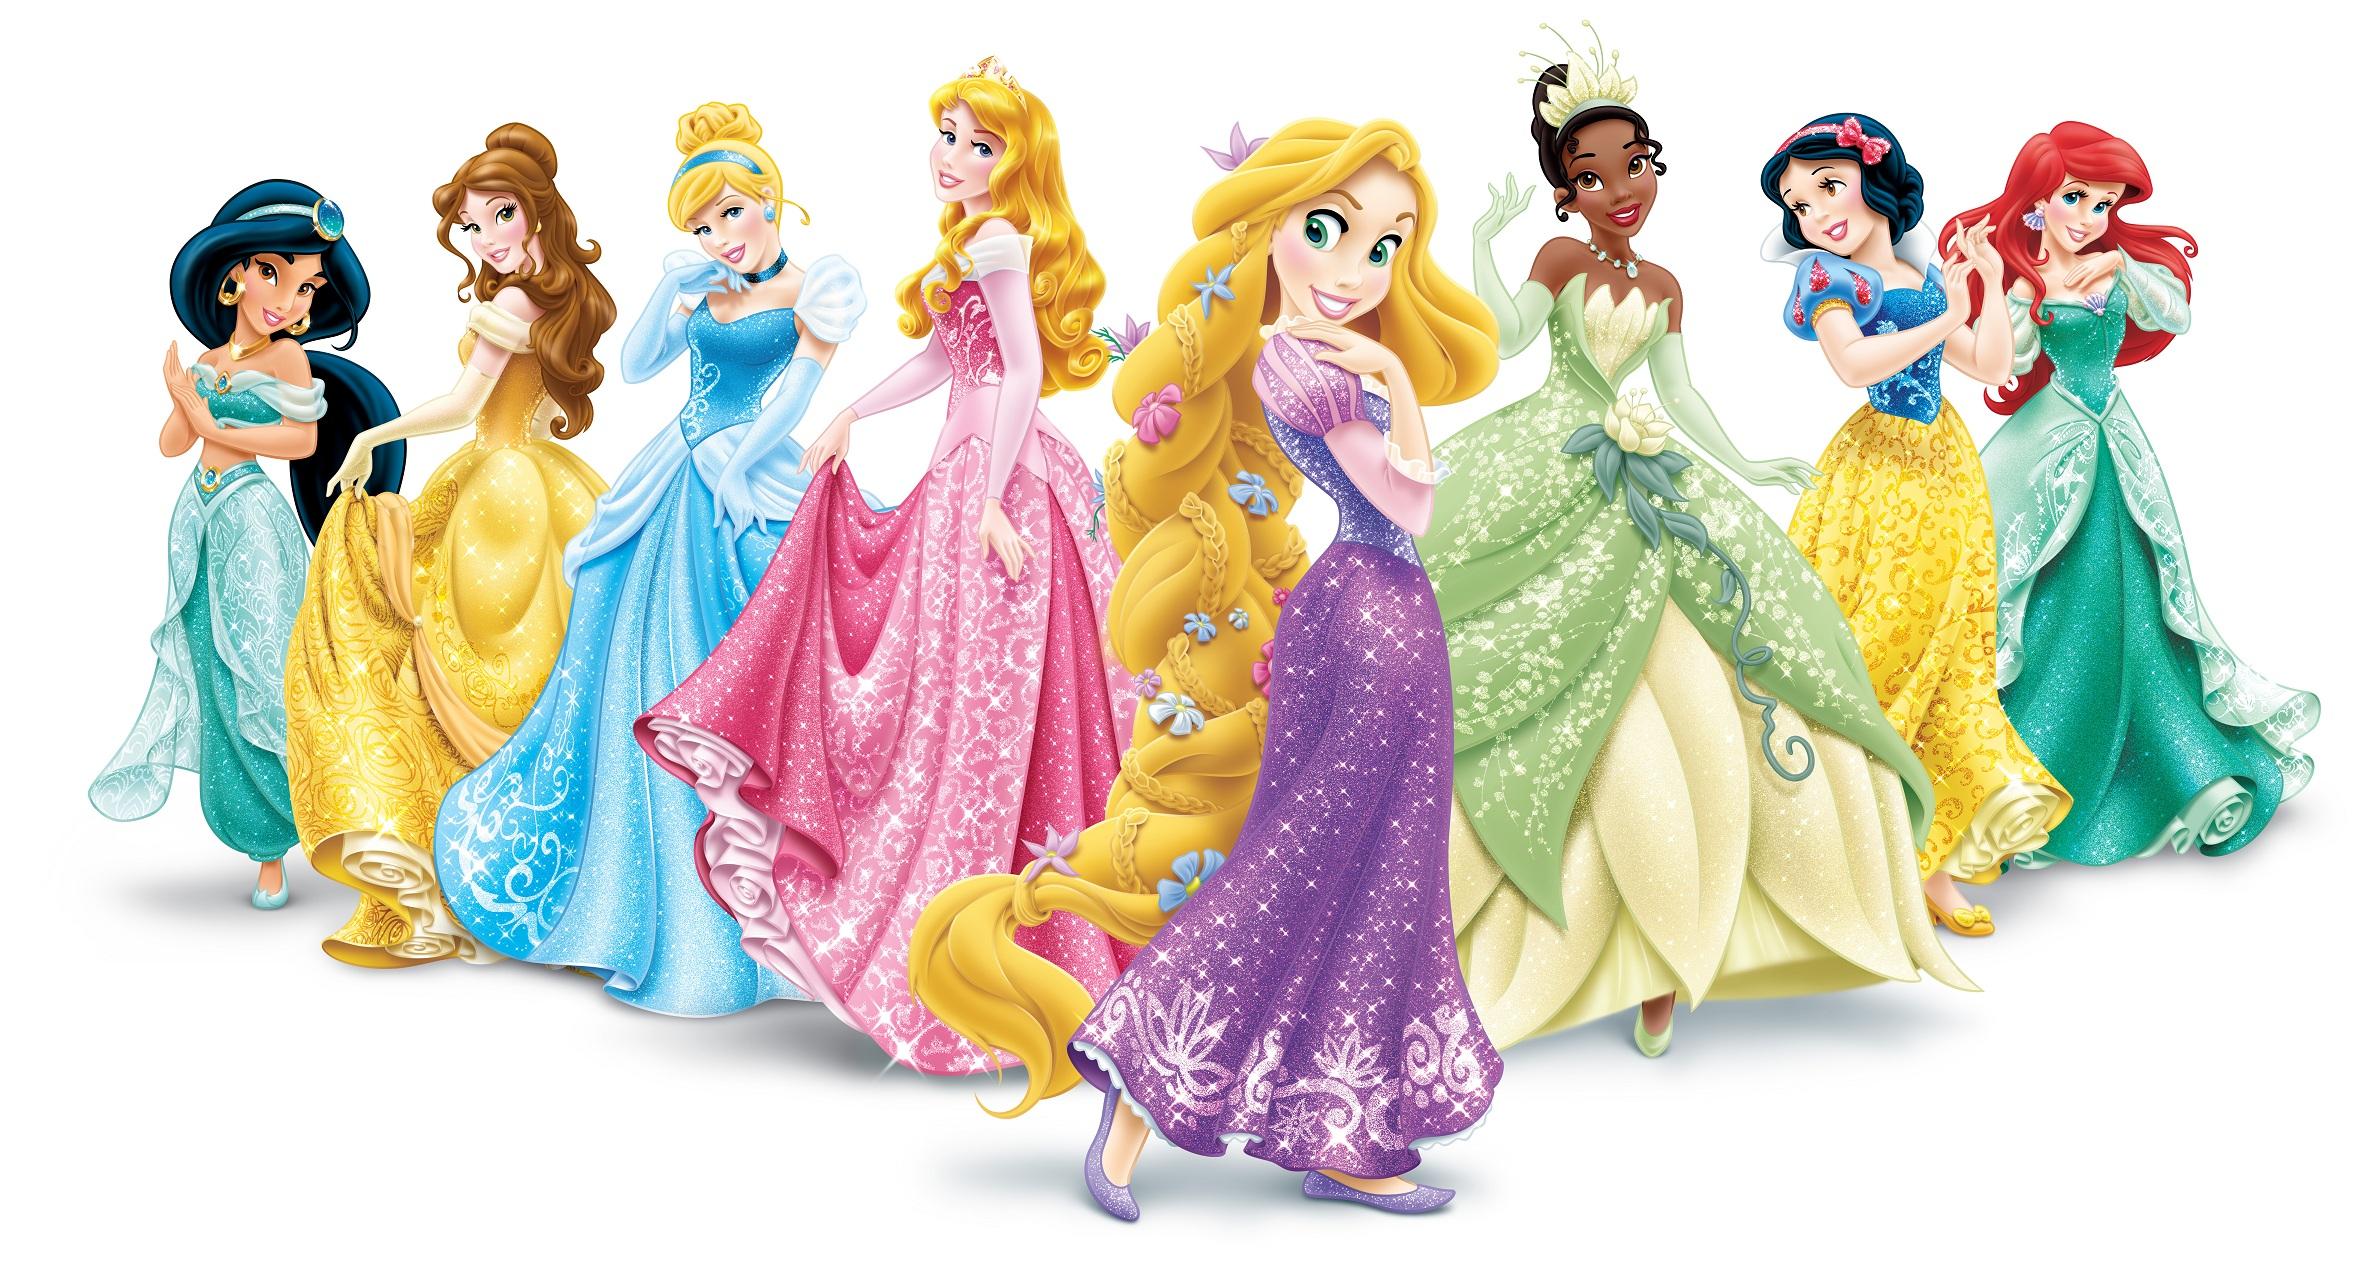 Disney Characters Pink Wallpapers HD Desktop Background 2370x1262